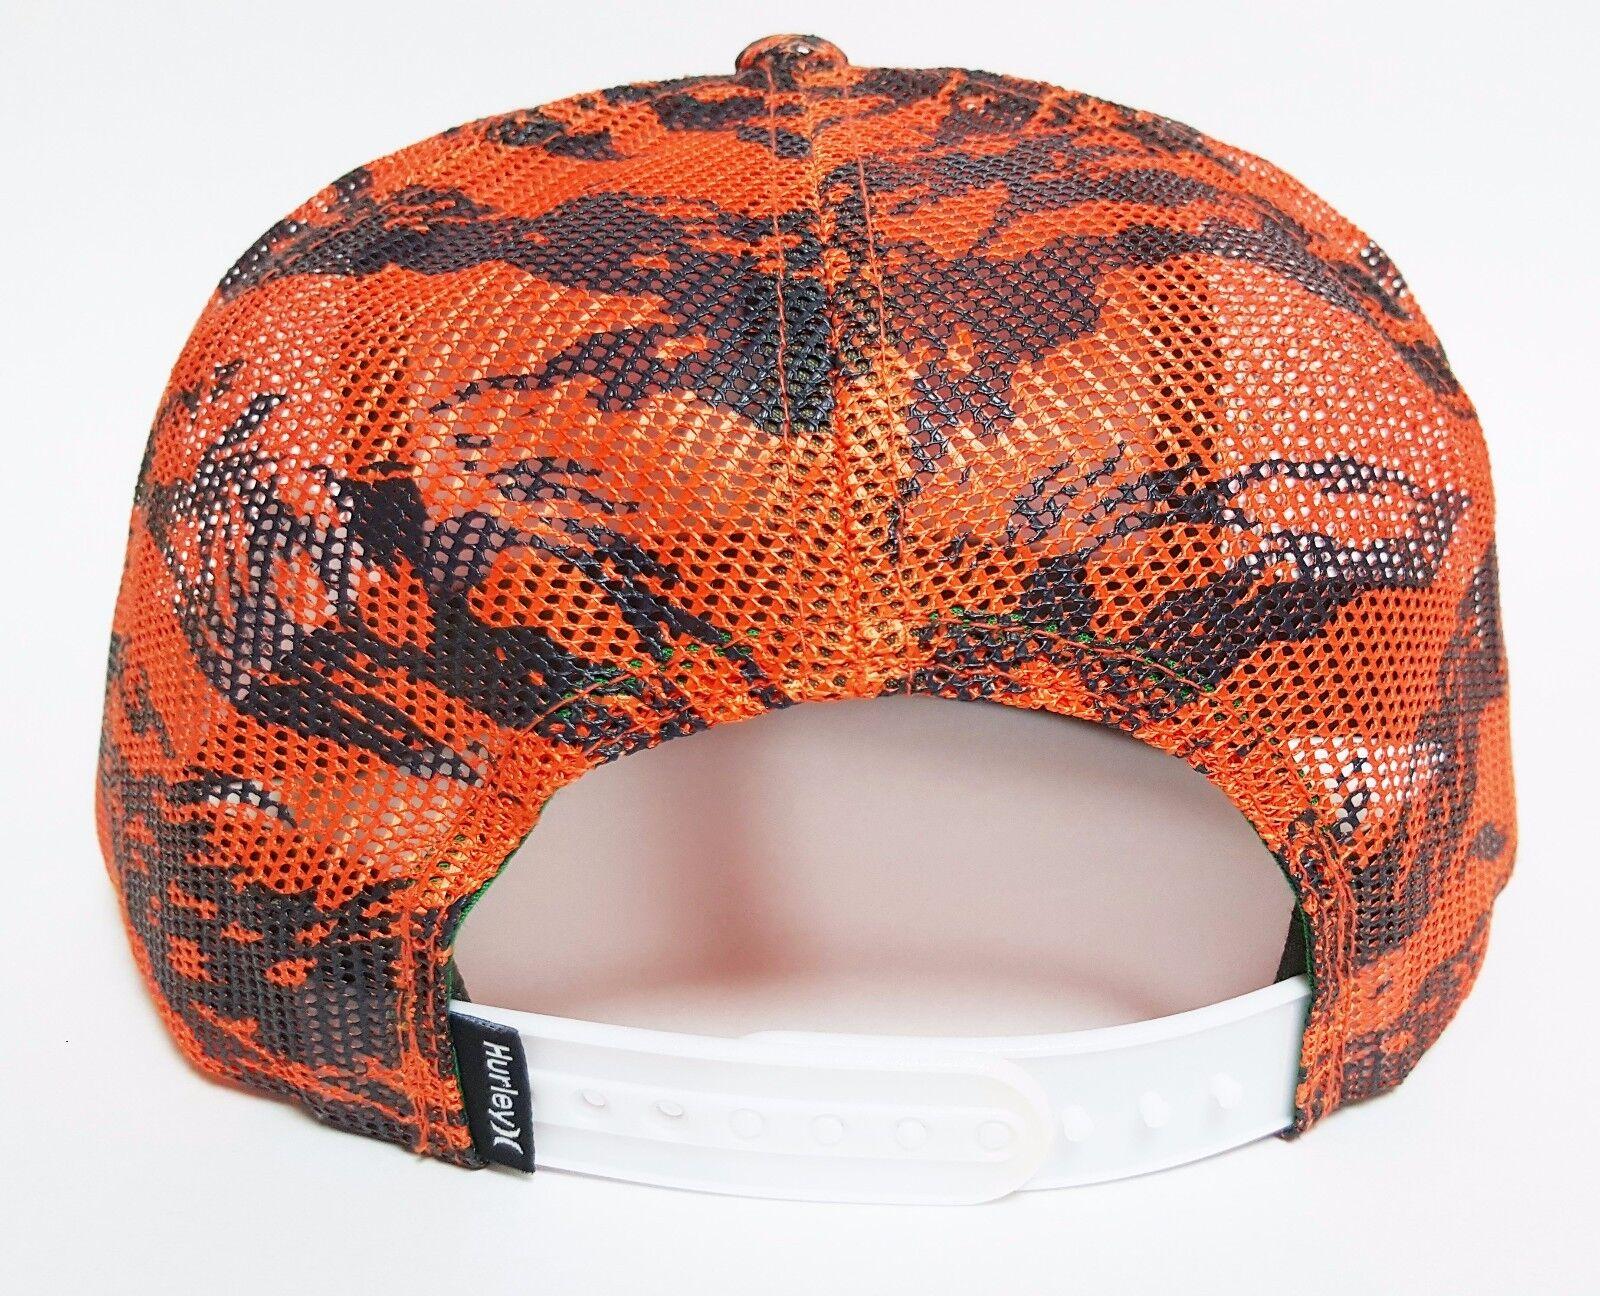 559bac1c4e8 Hurley KRUSH Mesher Snapback Hat Orange OSFA ( ) All-mesh Skate Camo Cap  for sale online